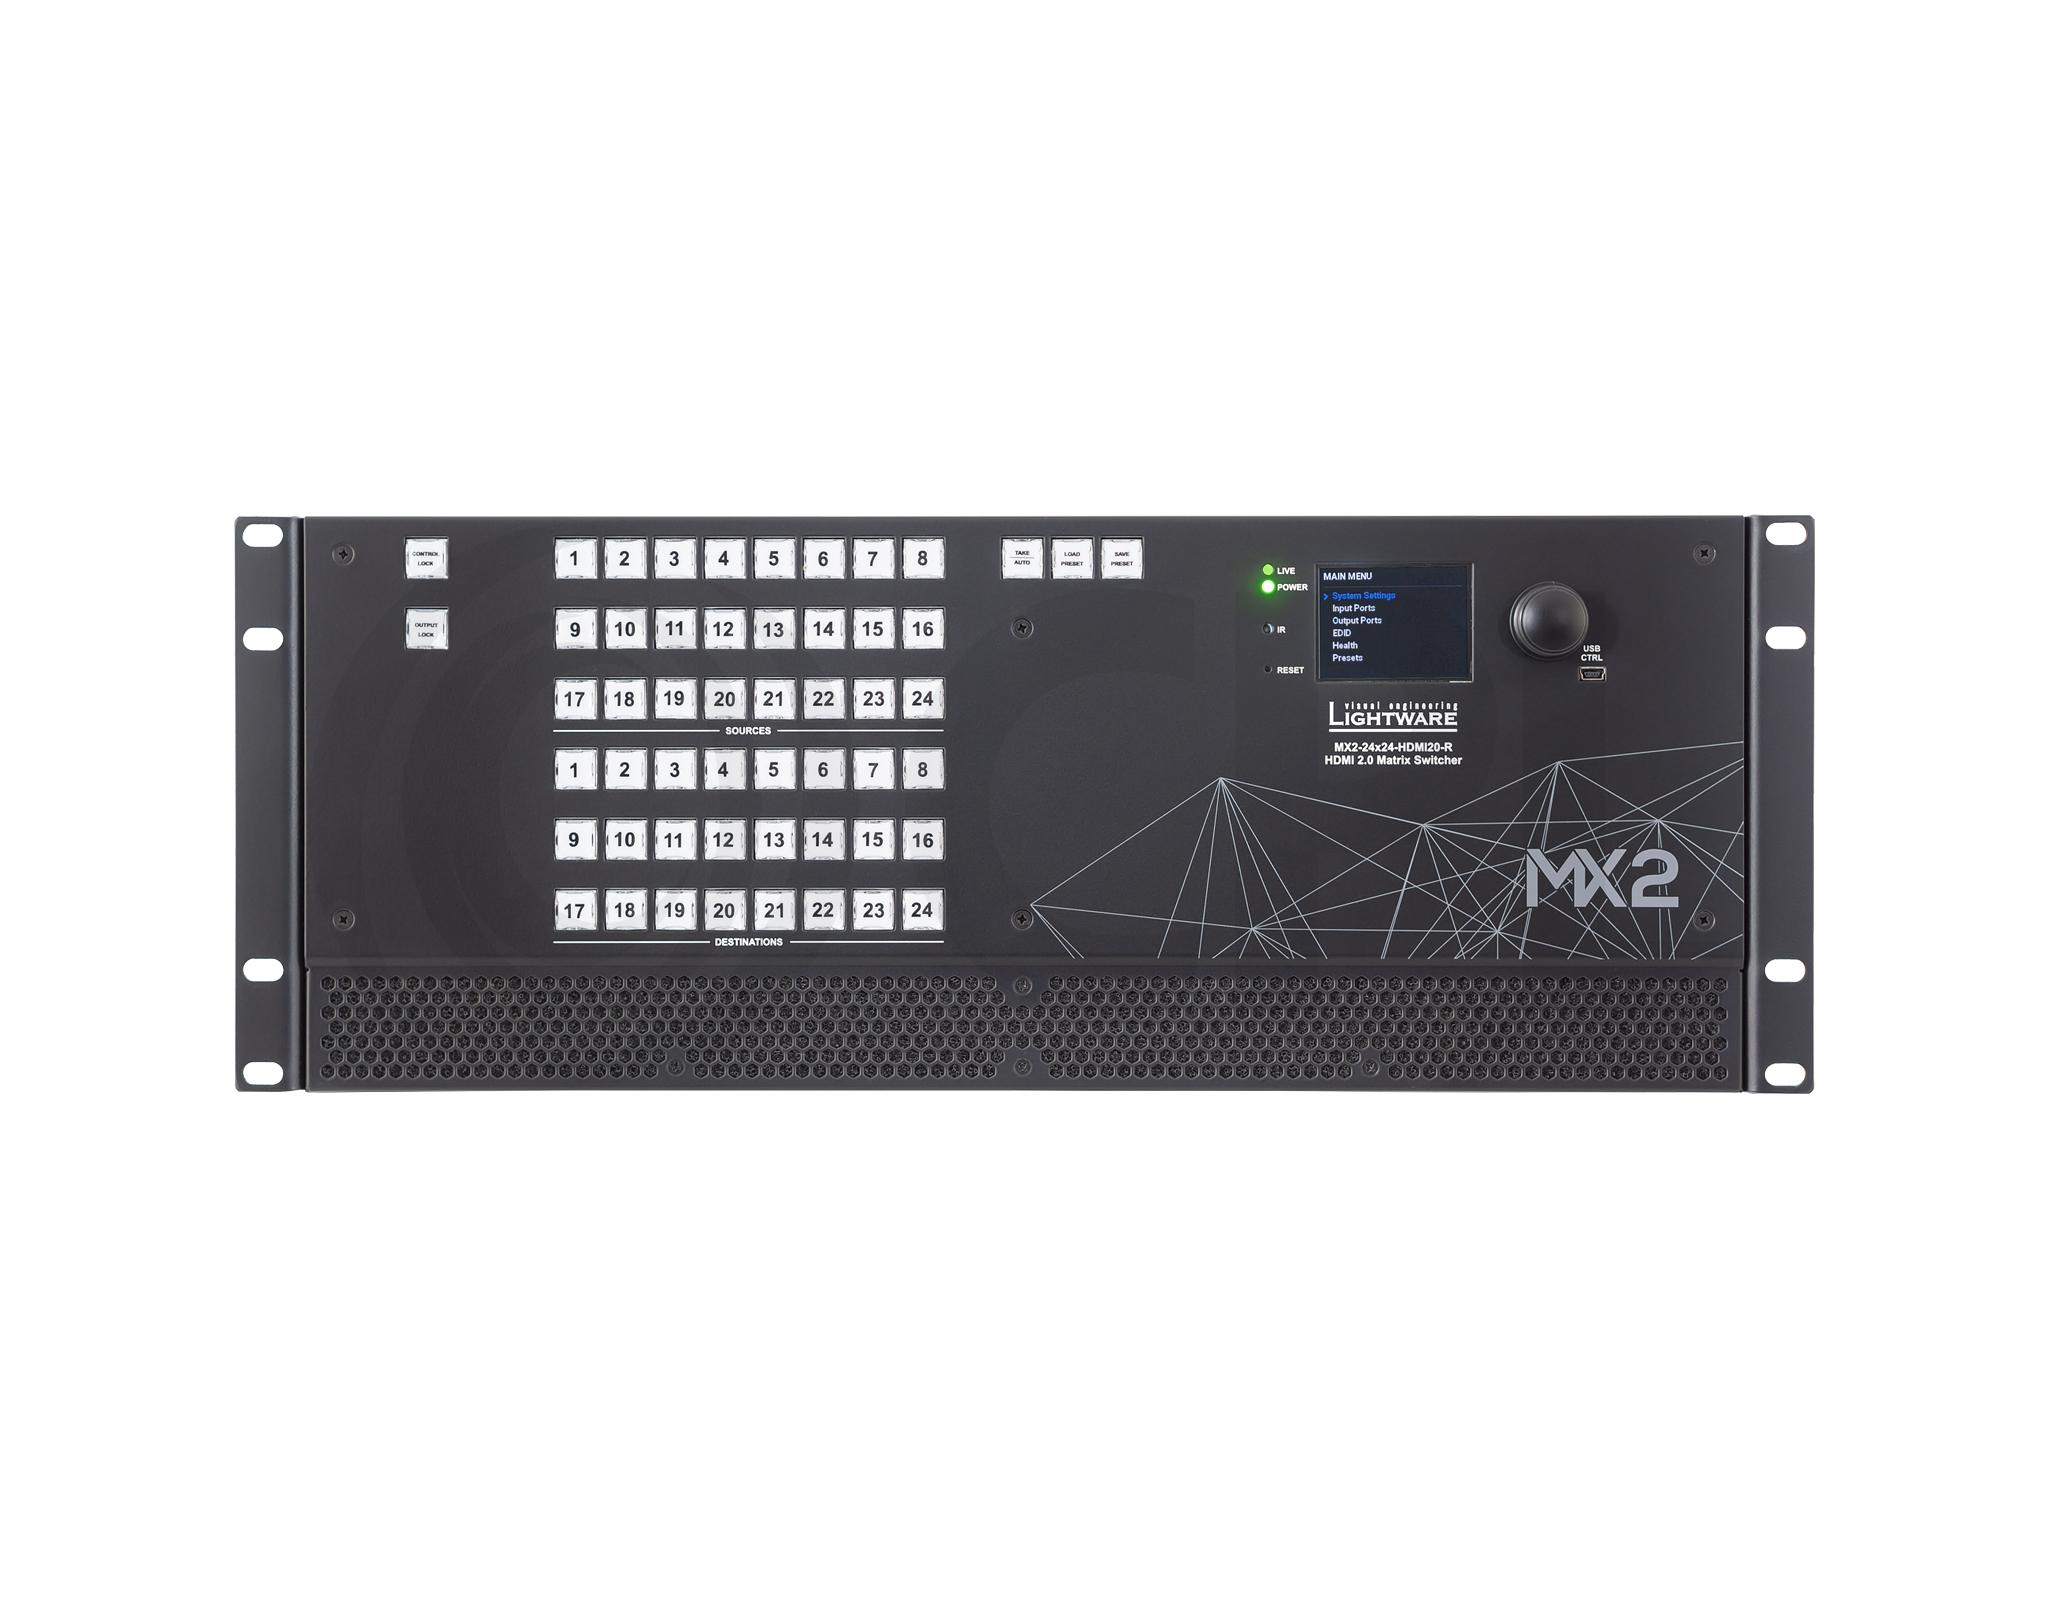 MX2-24x24-HDMI20 Front